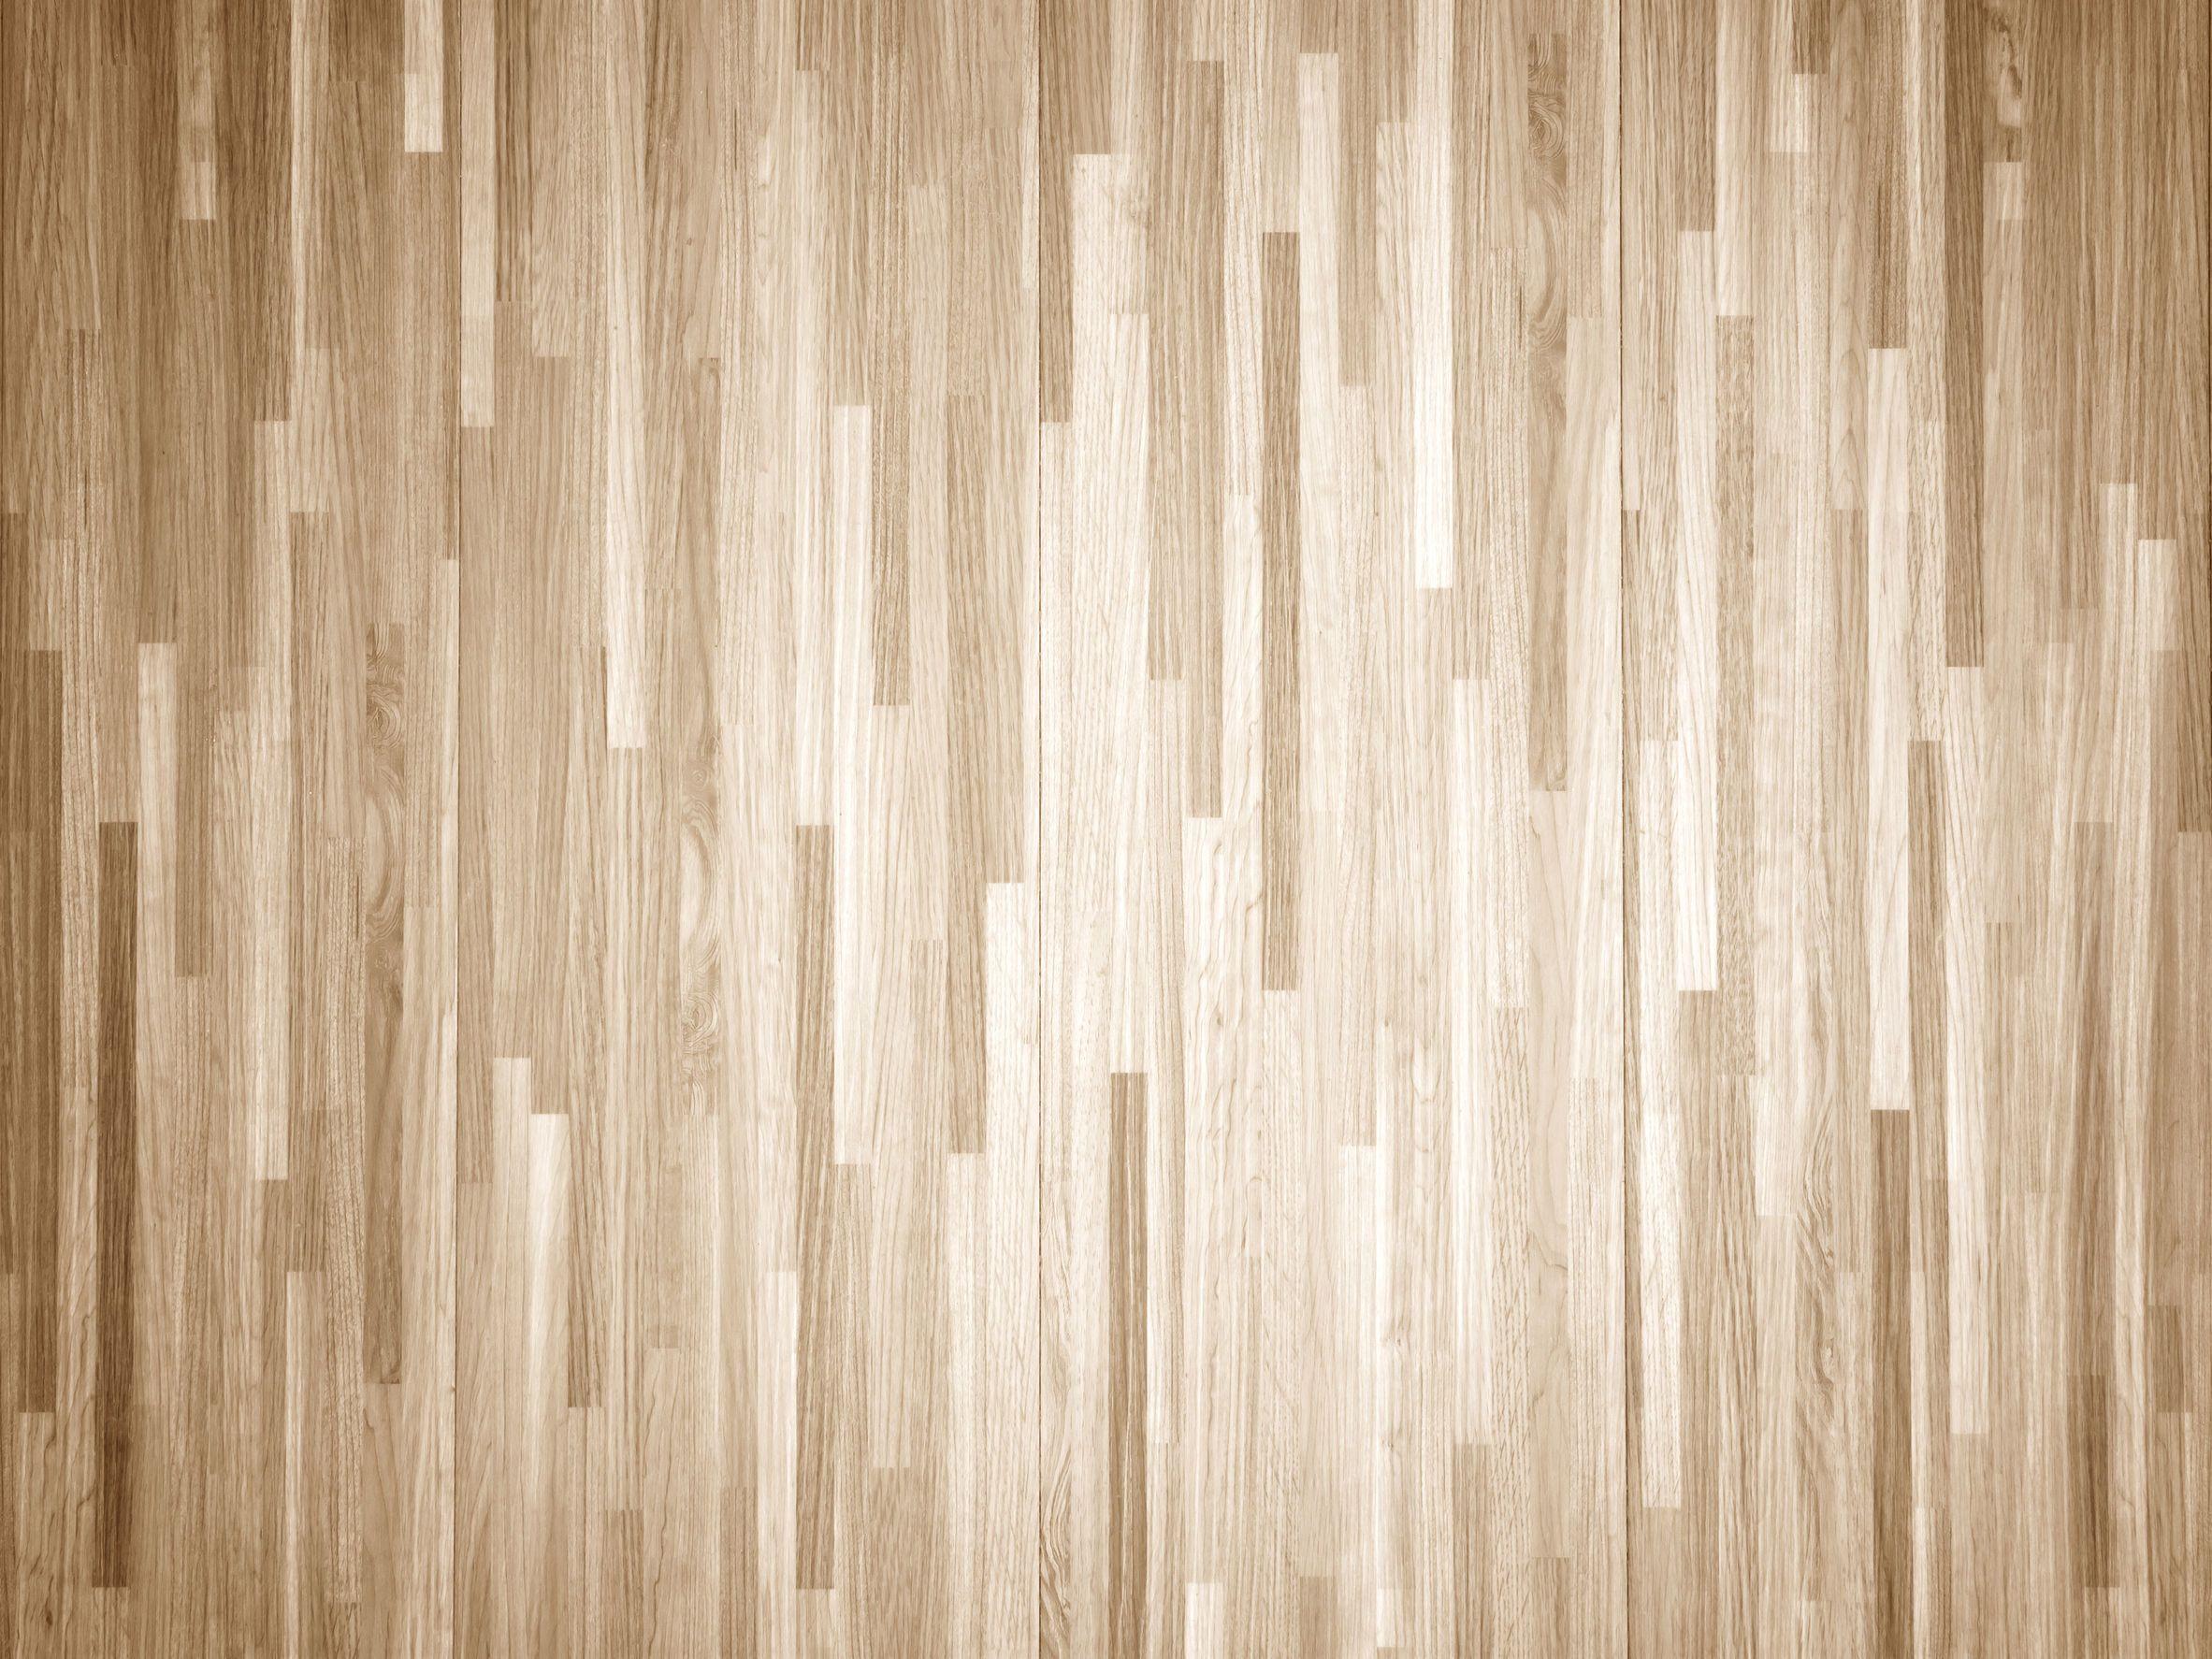 sanding hardwood floors cost of how to chemically strip wood floors woodfloordoctor com regarding you